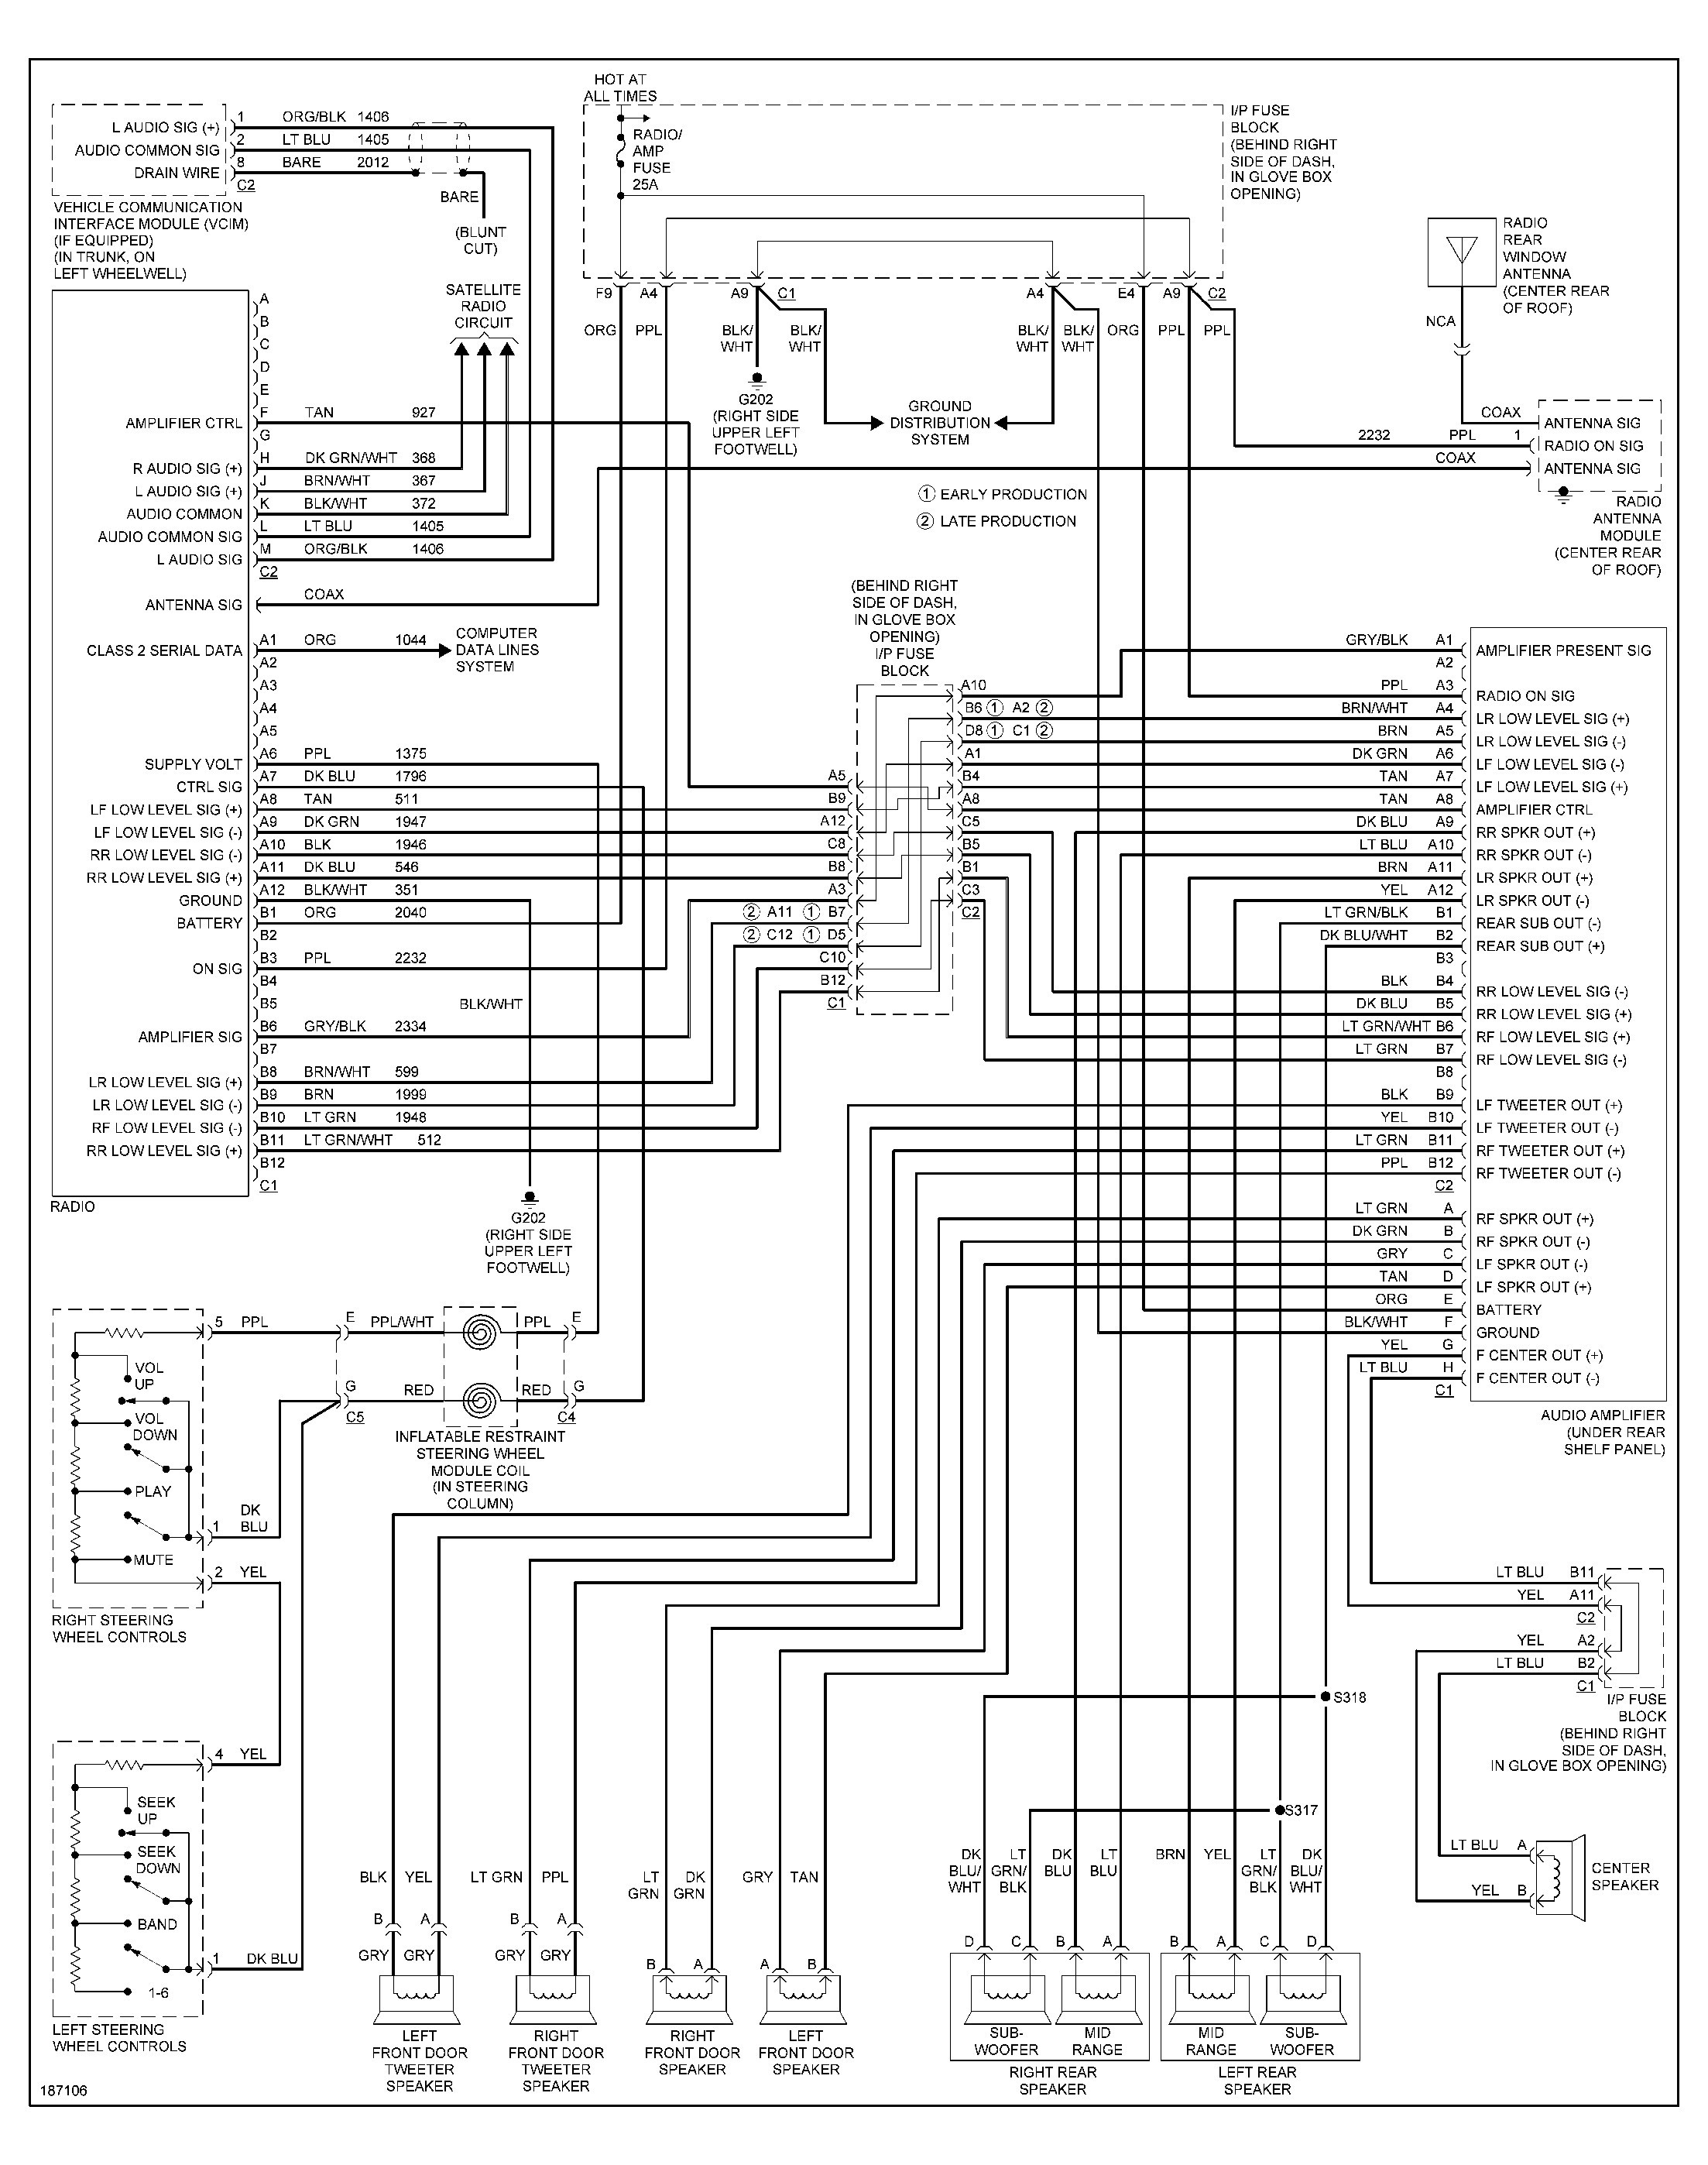 2005 pontiac grand prix radio wiring diagram elegant 2001 pontiac grand prix radio wiring diagram pontiac wiring wiring of 2005 pontiac grand prix radio wiring diagram